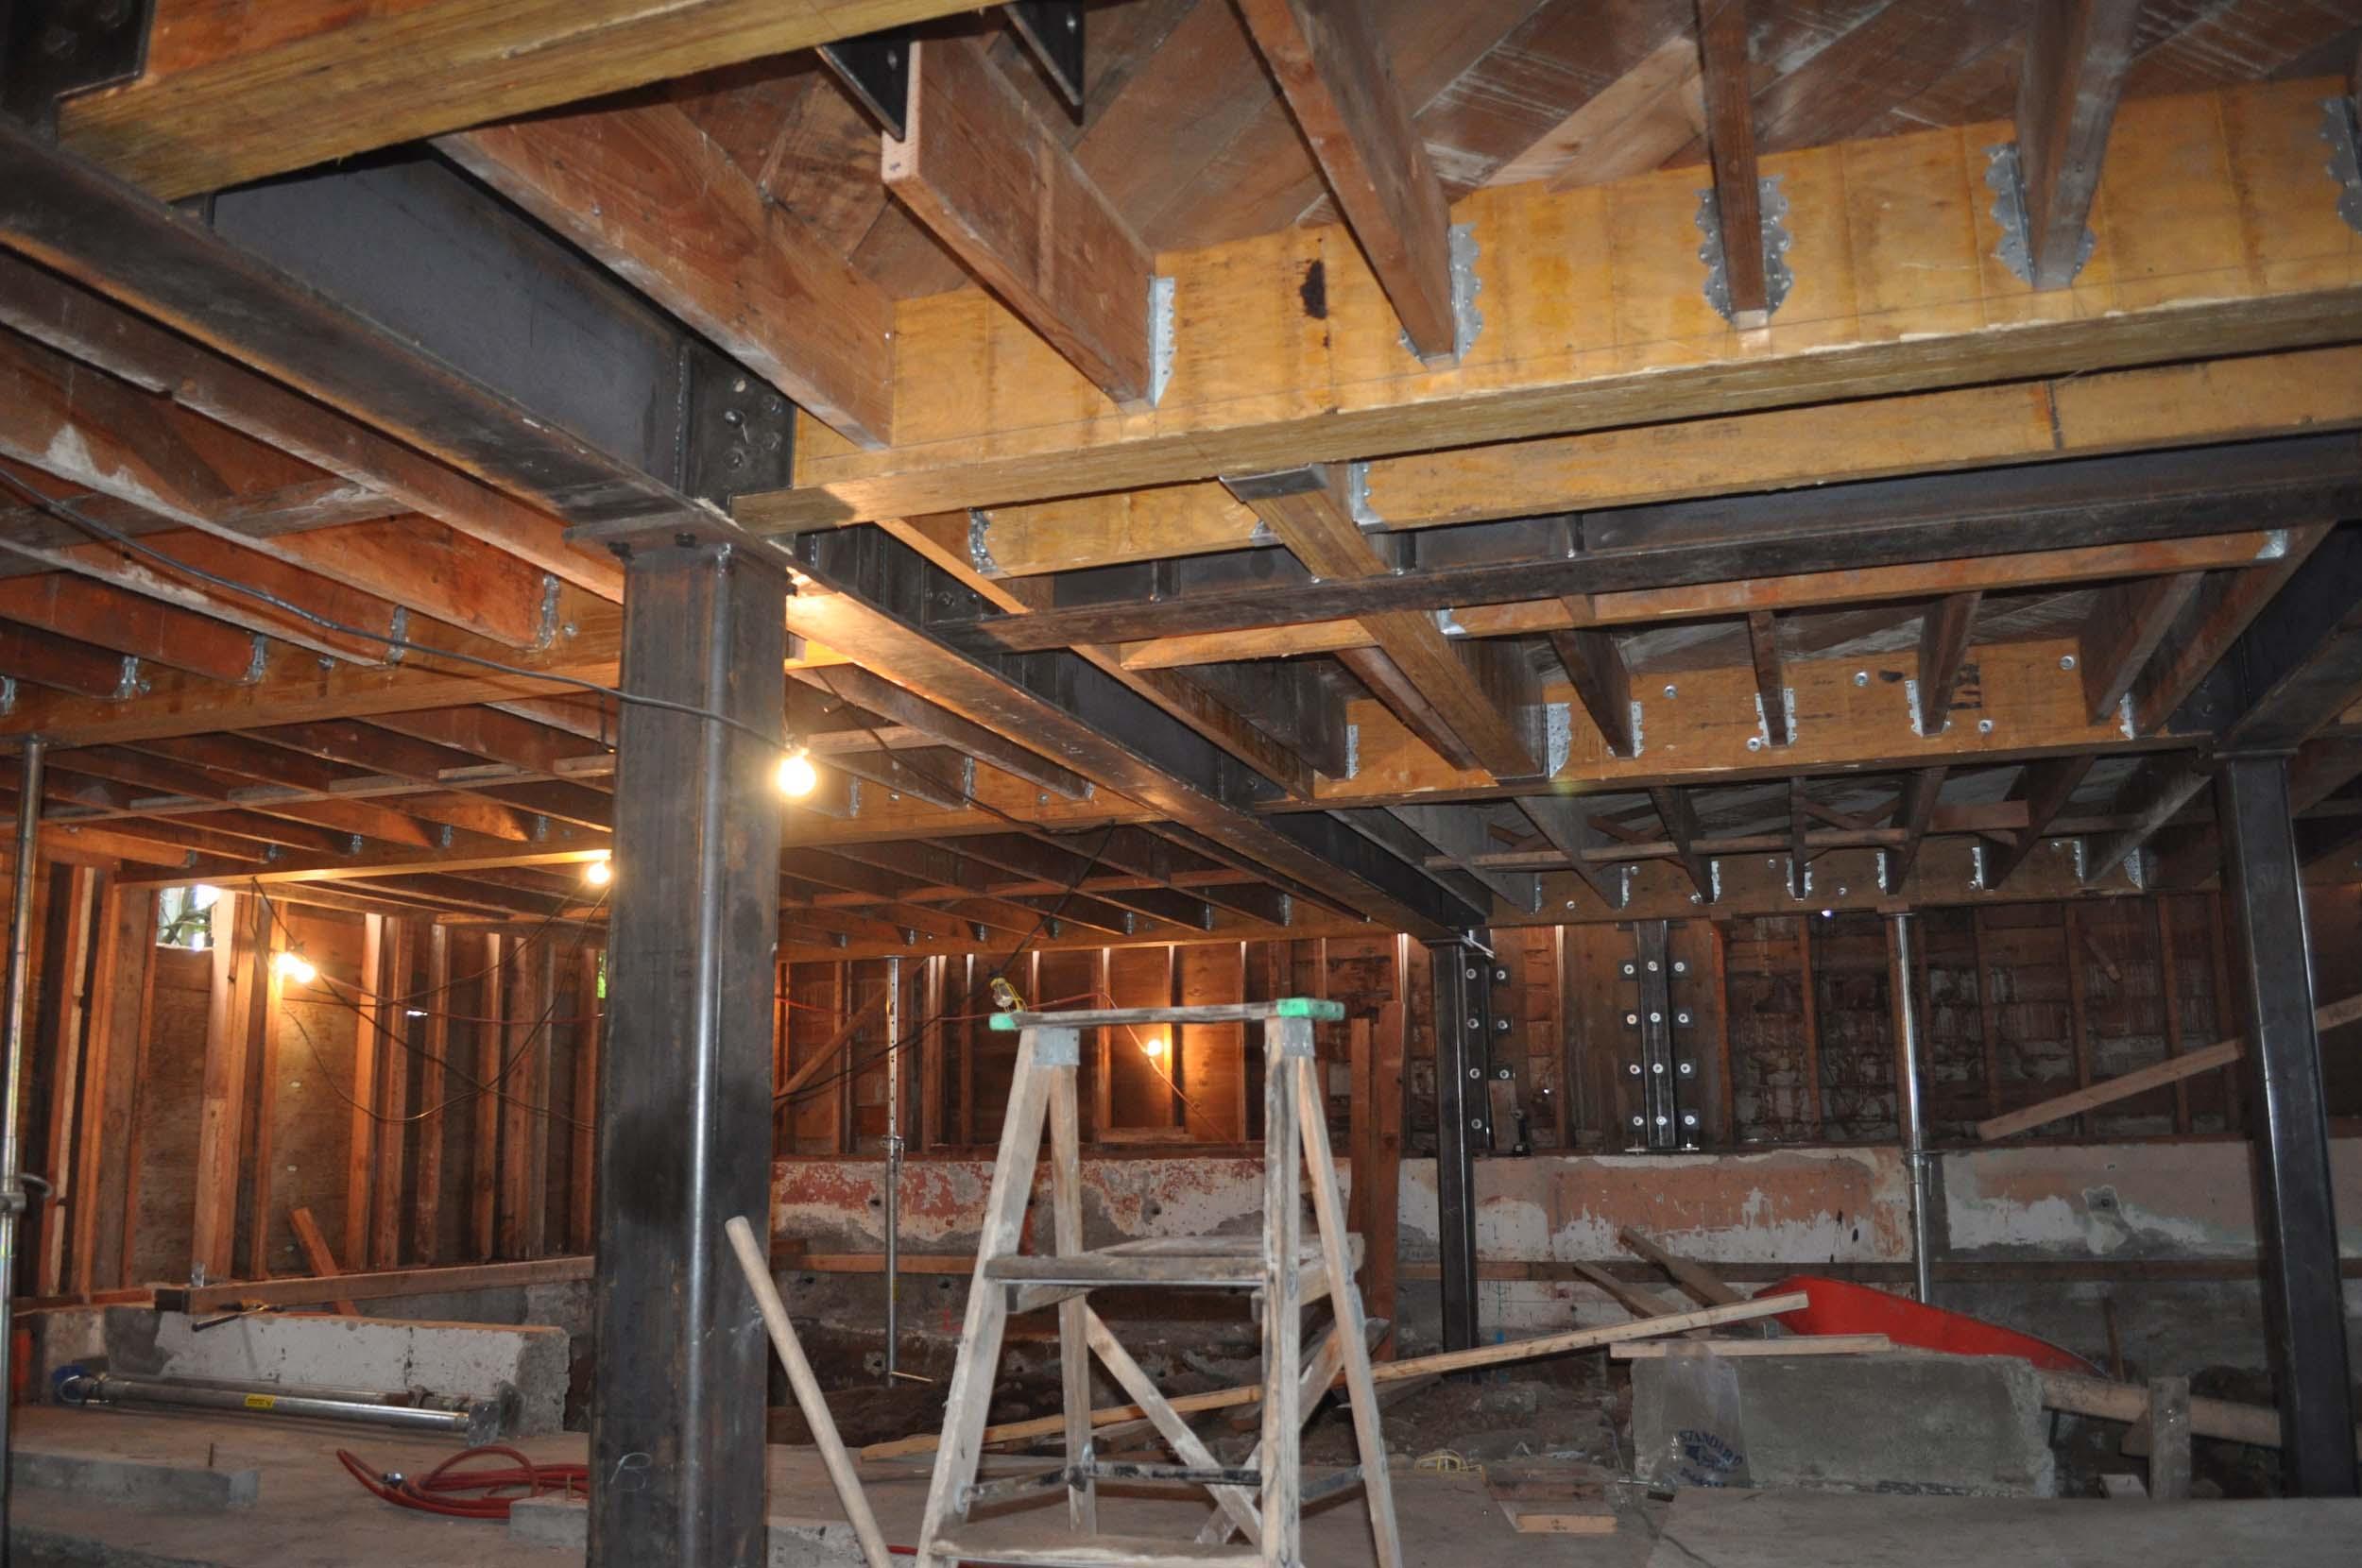 Postle_Construction_WoodFraming24.jpg